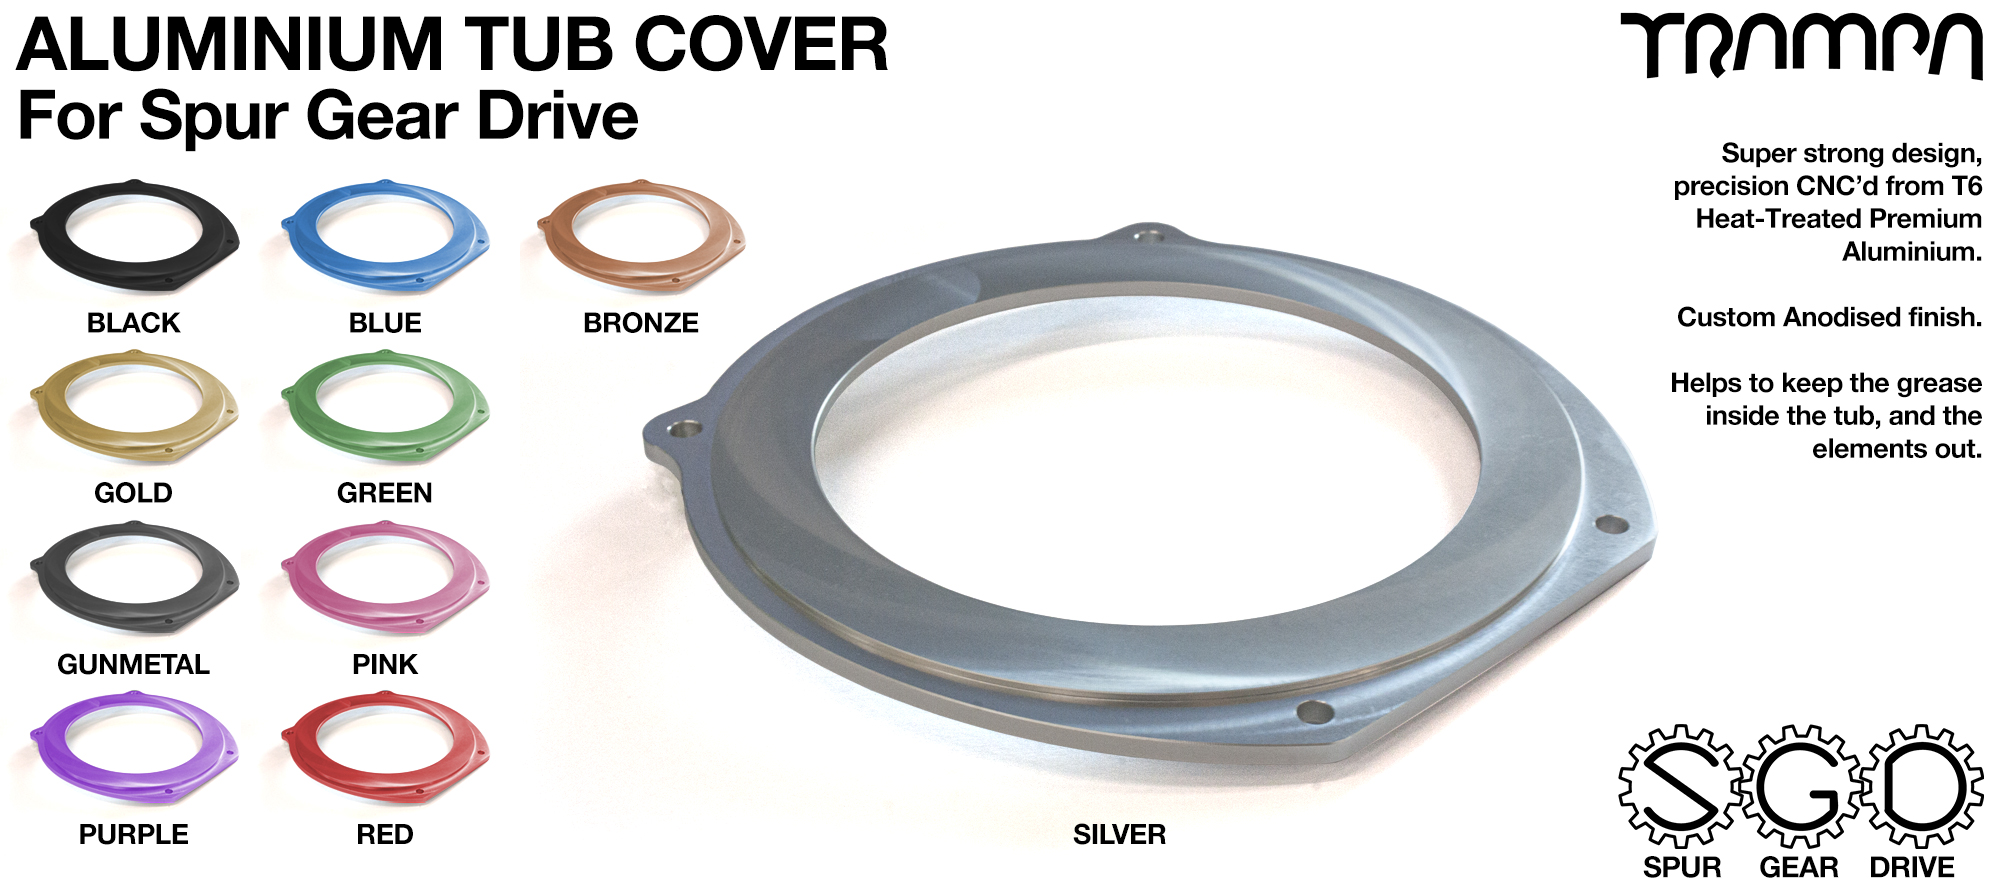 TRAMPA SPUR Gear Drive T6 Aluminium Tub Cover